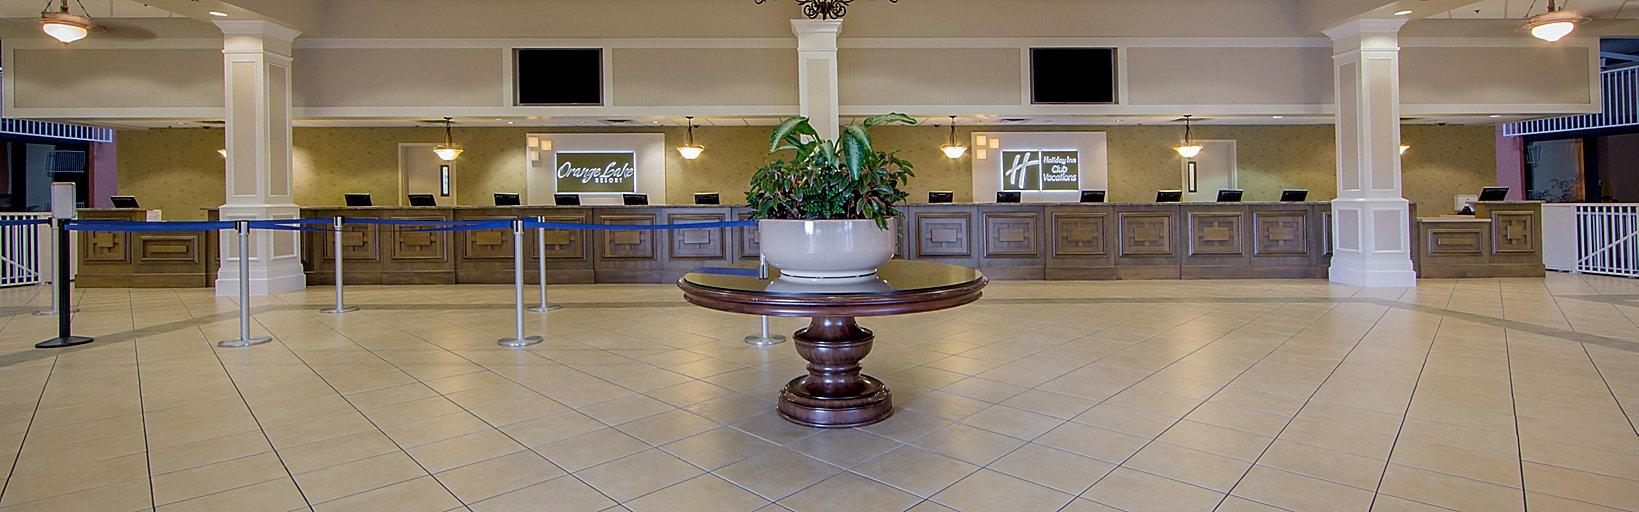 Orlando Hotels With Pools Near Kissimmee Fl Holiday Inn Club Vacation At Orange Lake Resort